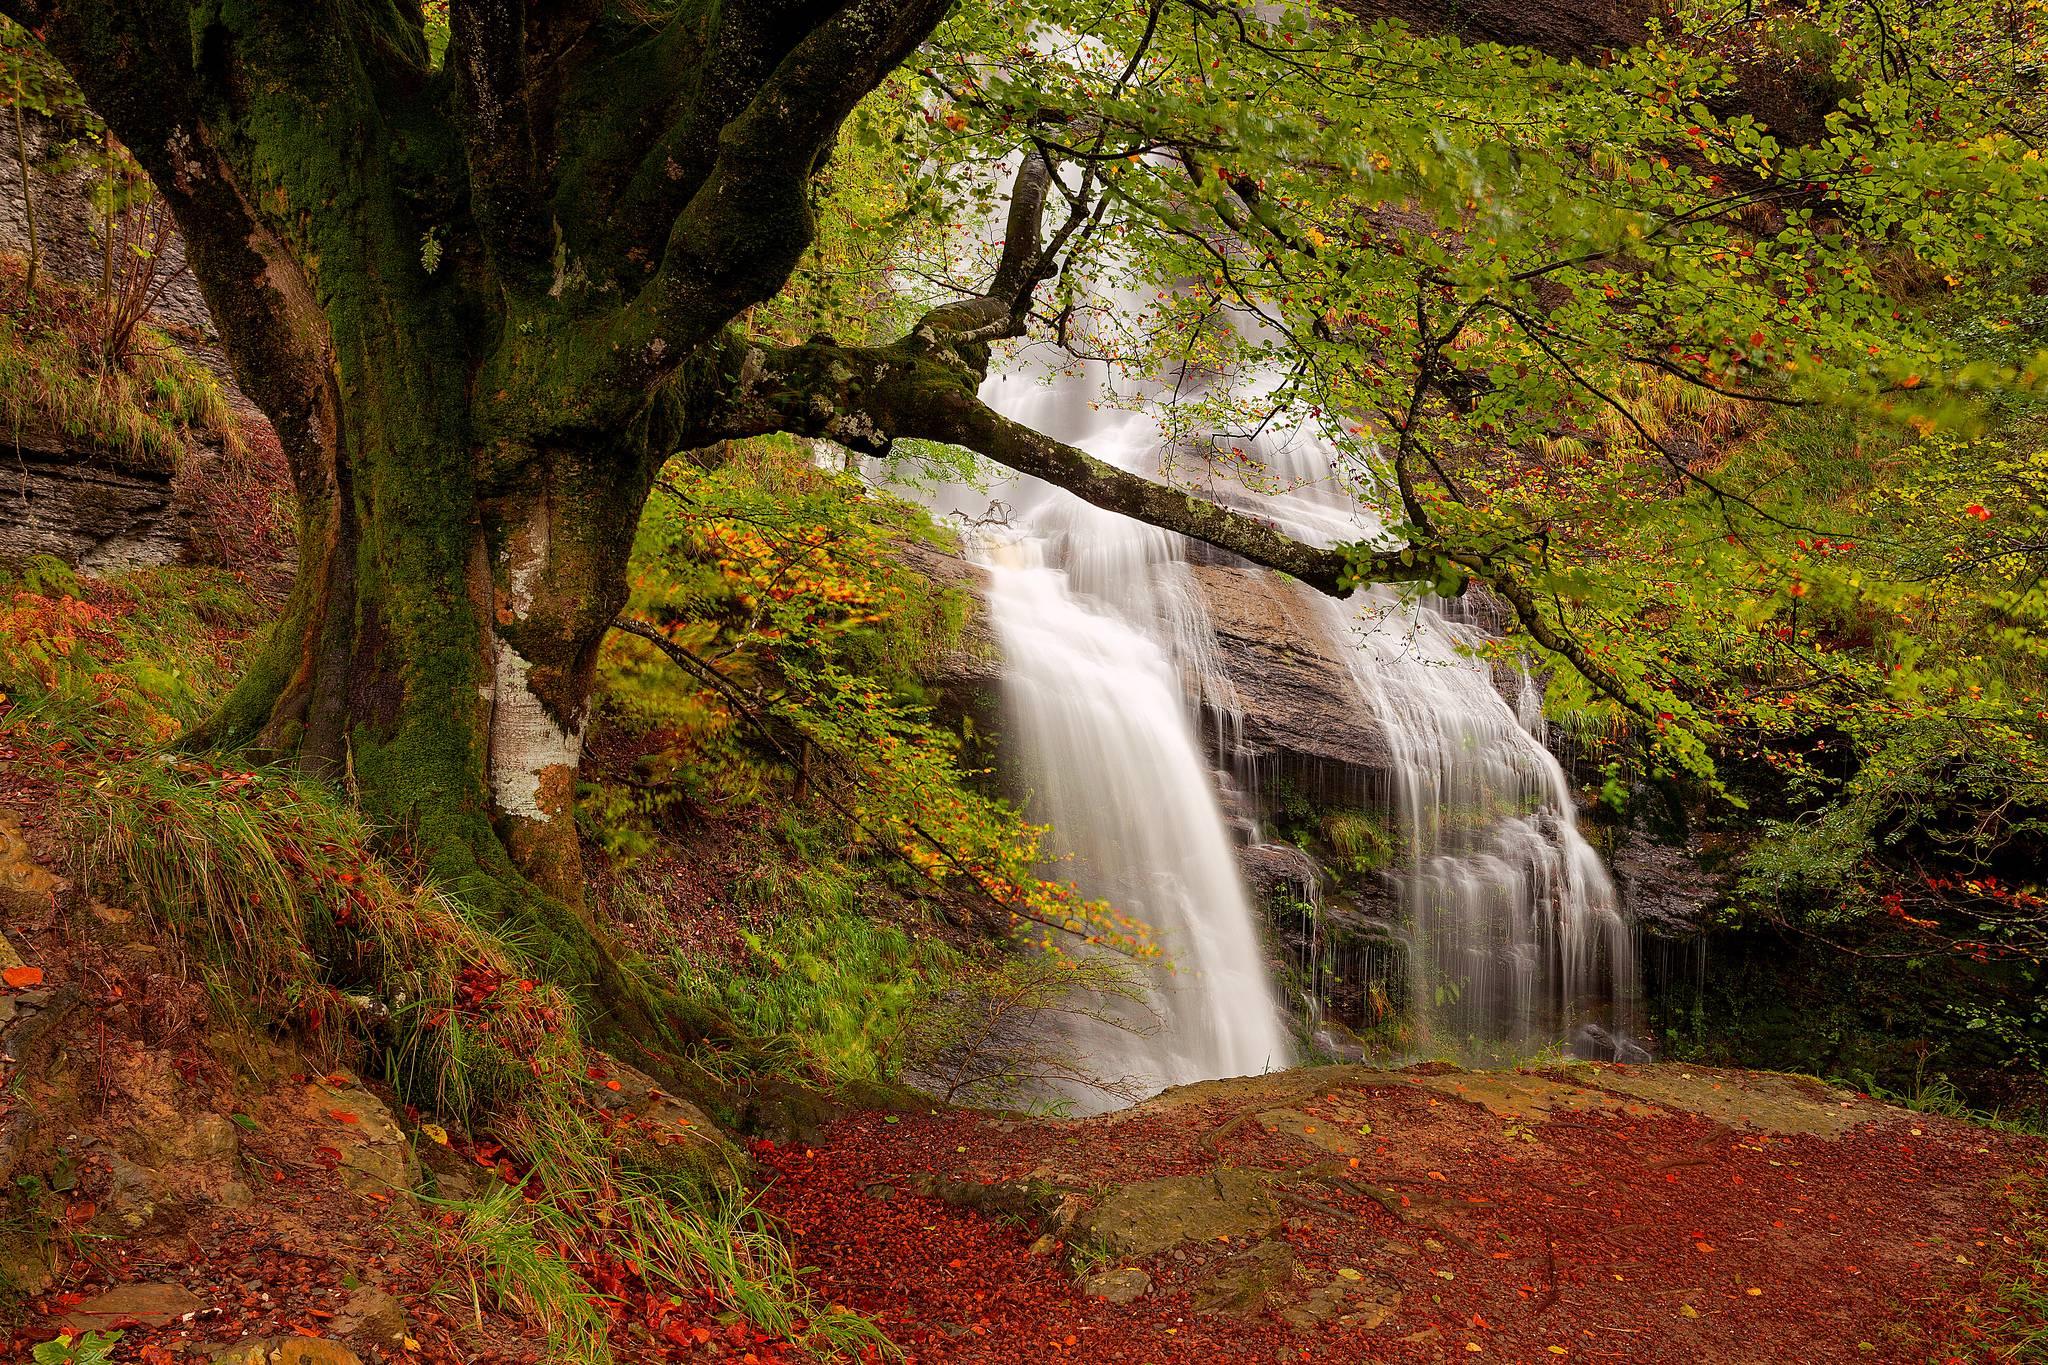 Uguna Waterfall, Gorbea Natural Park, Bizkaia